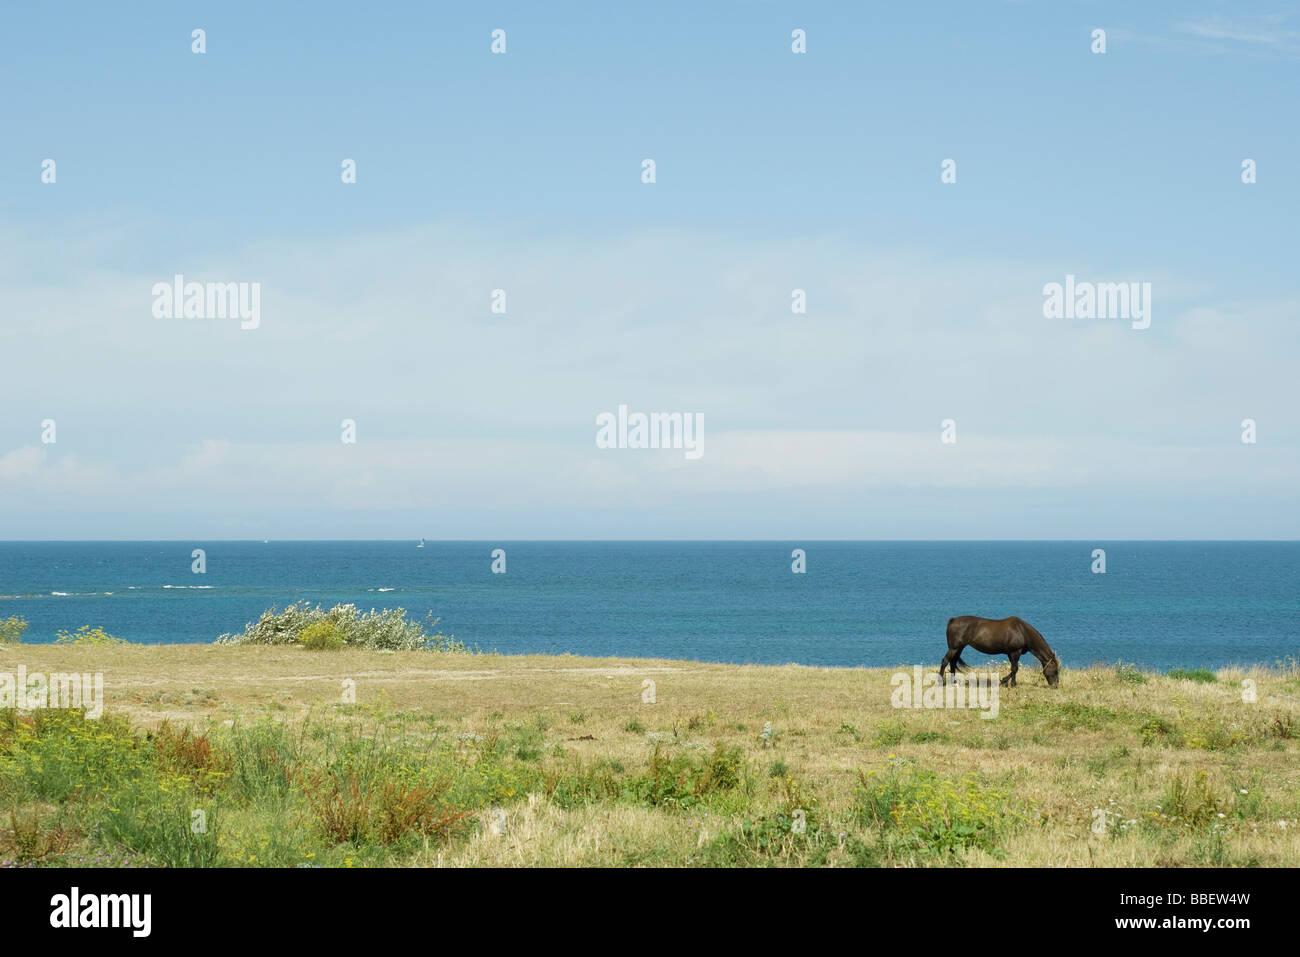 Horse grazing in coastal scene - Stock Image